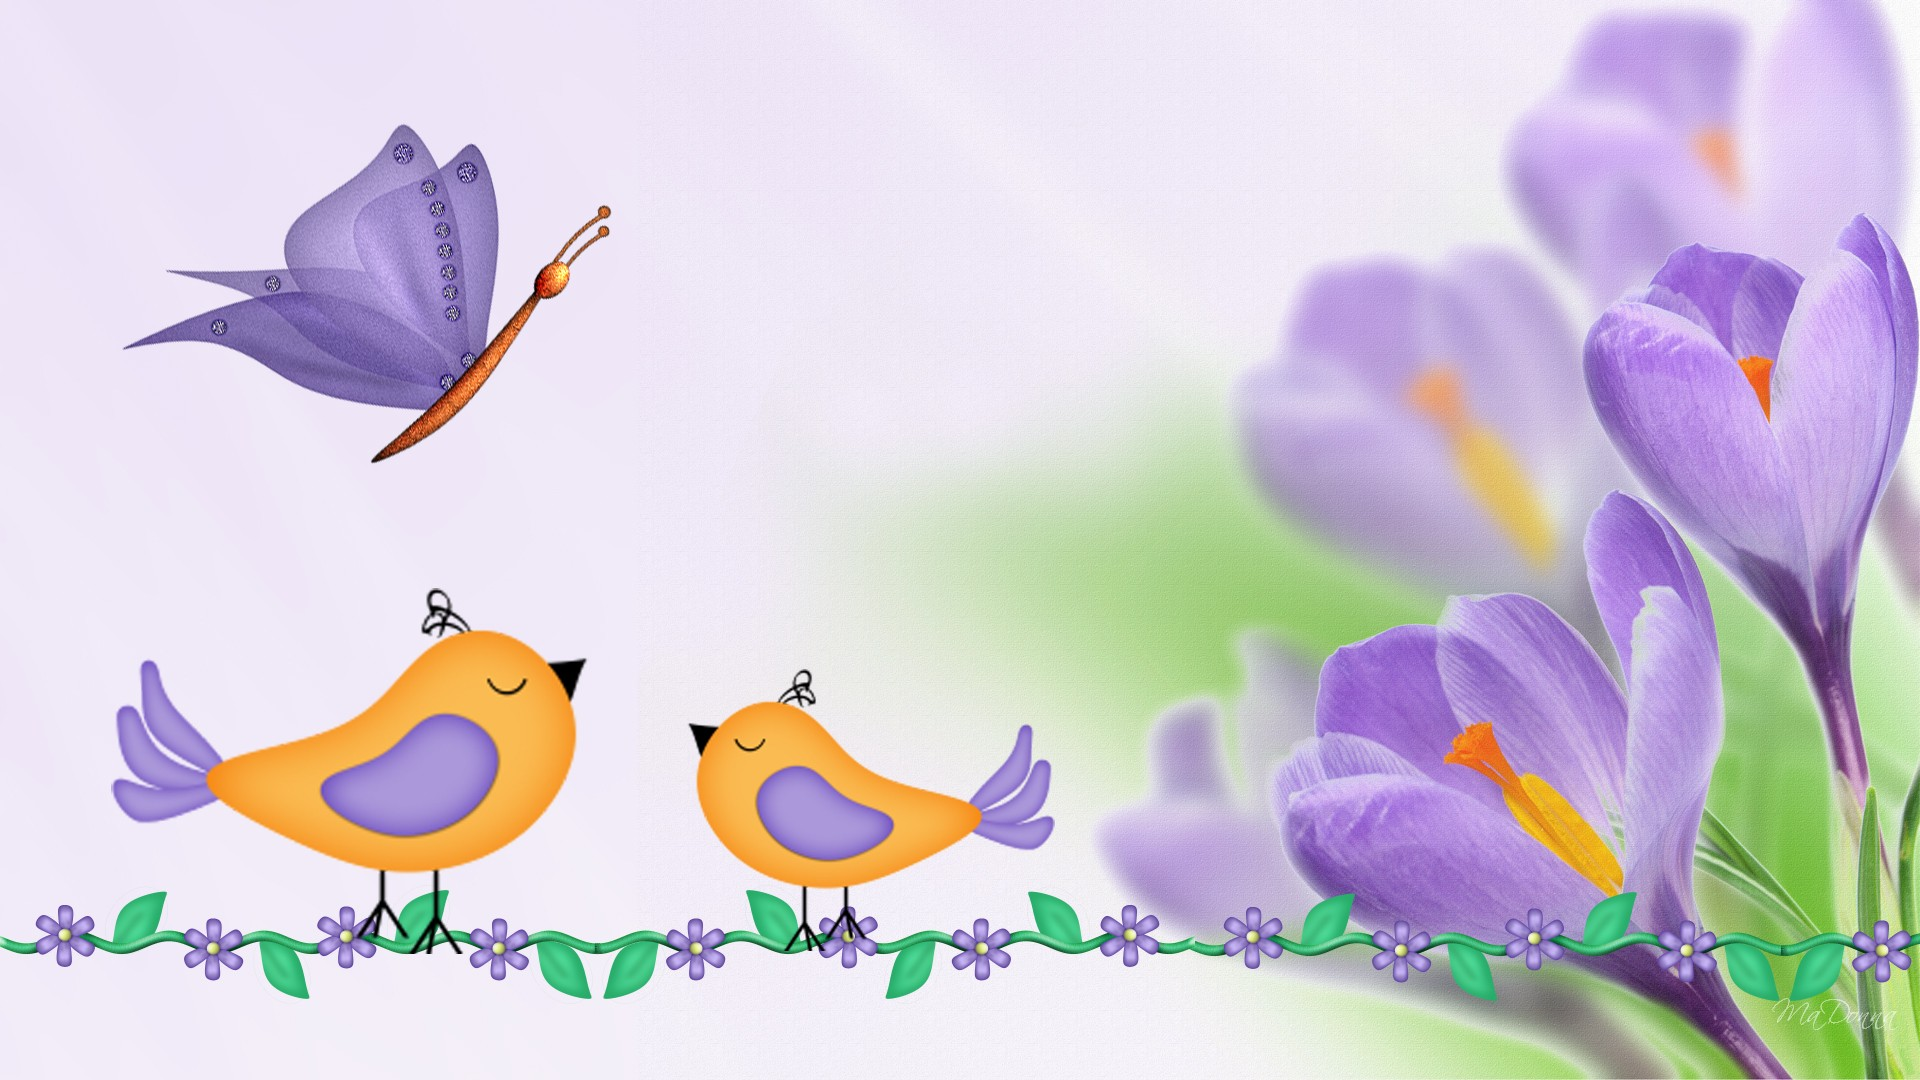 purple crocus birds and butterflyjpg 1920x1080